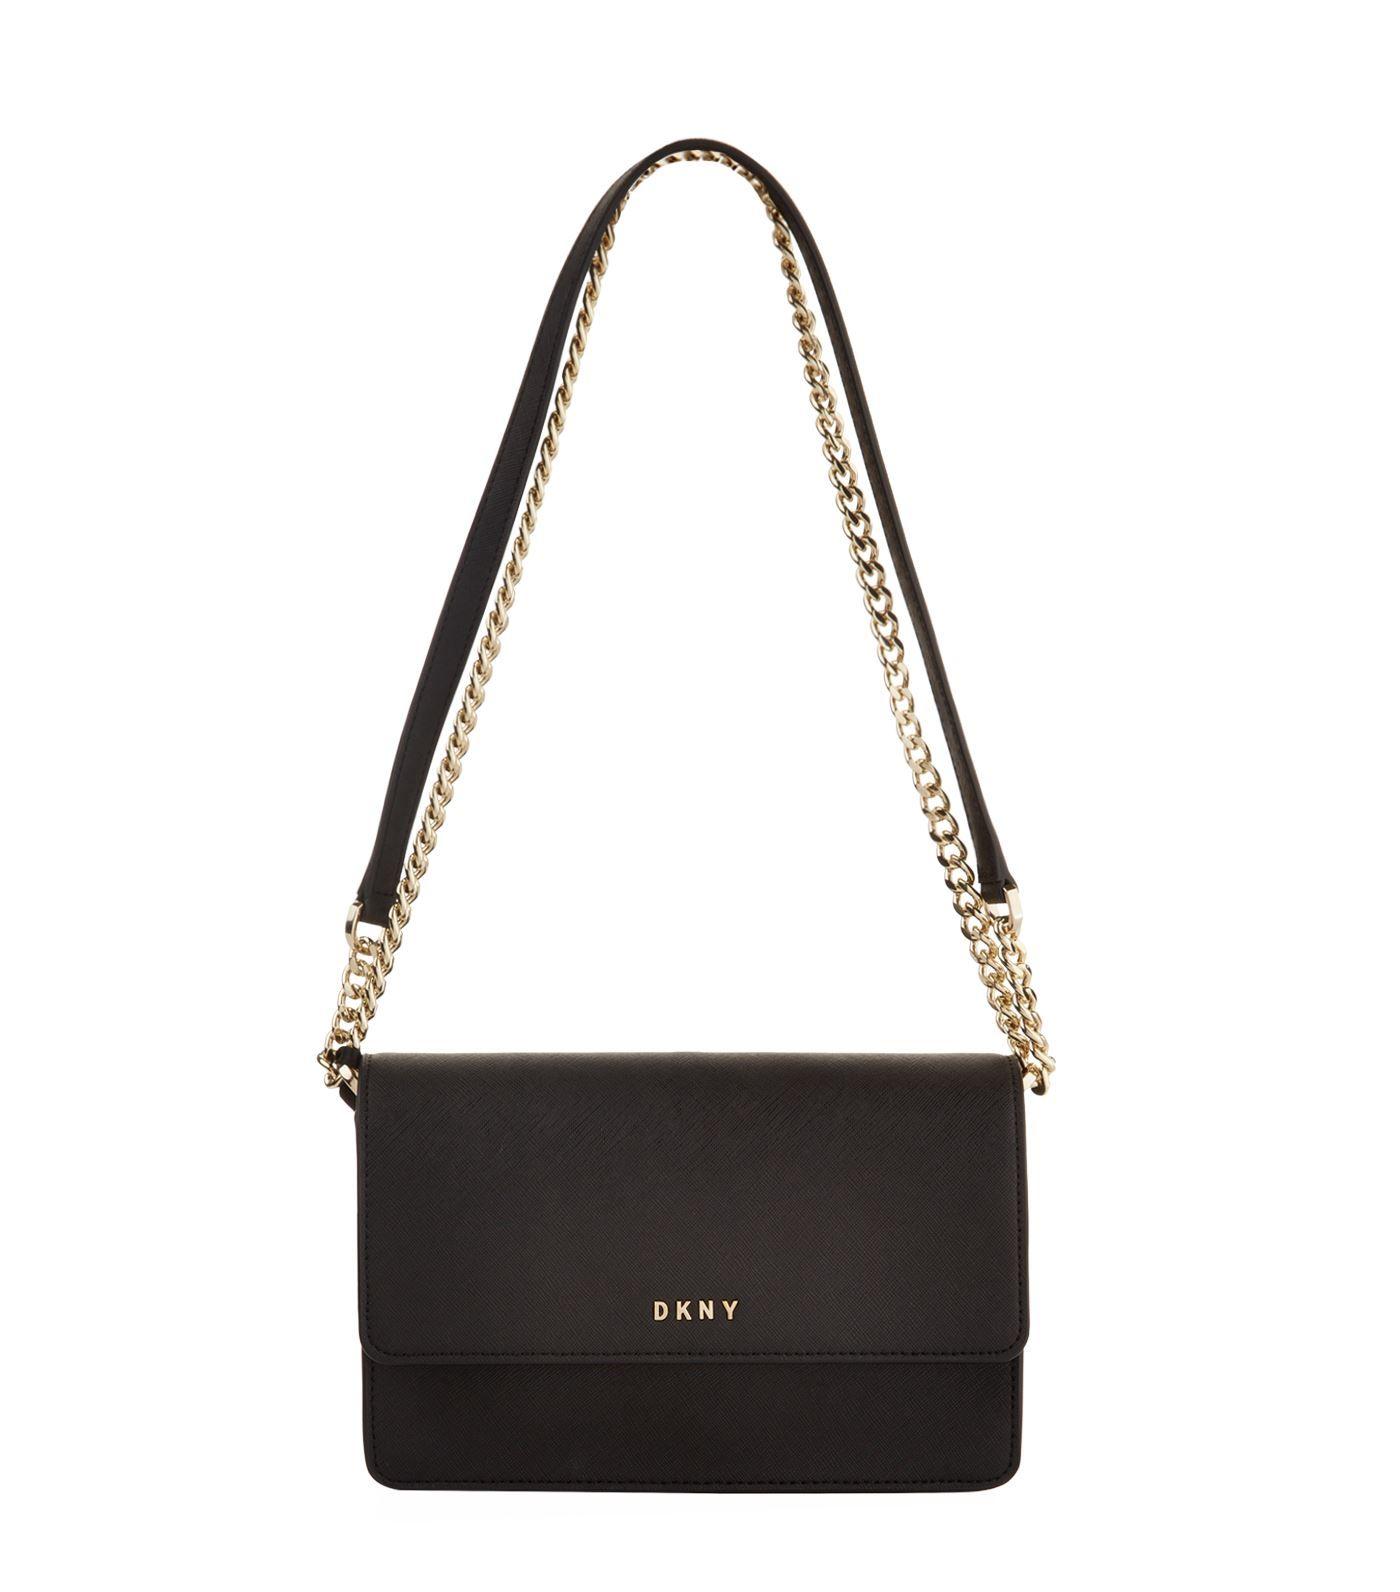 8b4e5facd9e DKNY .  dkny  bags  shoulder bags  leather     Dkny   Pinterest ...